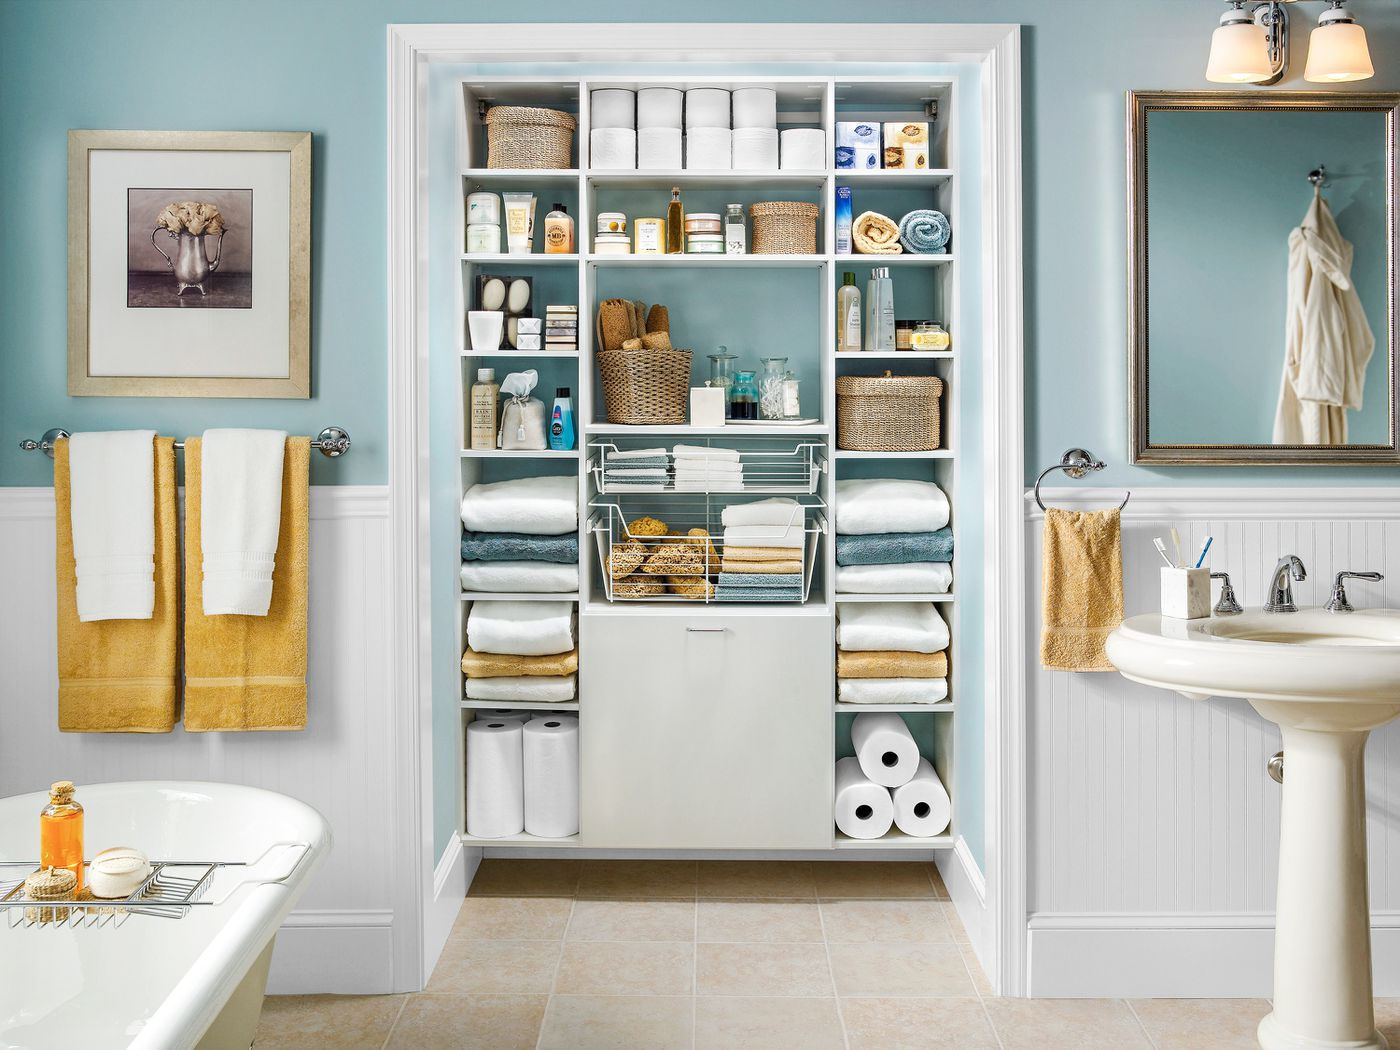 Bathroom Mural Closet Storage Box Cabinet Shower Clothes Organizer Folding Shelf